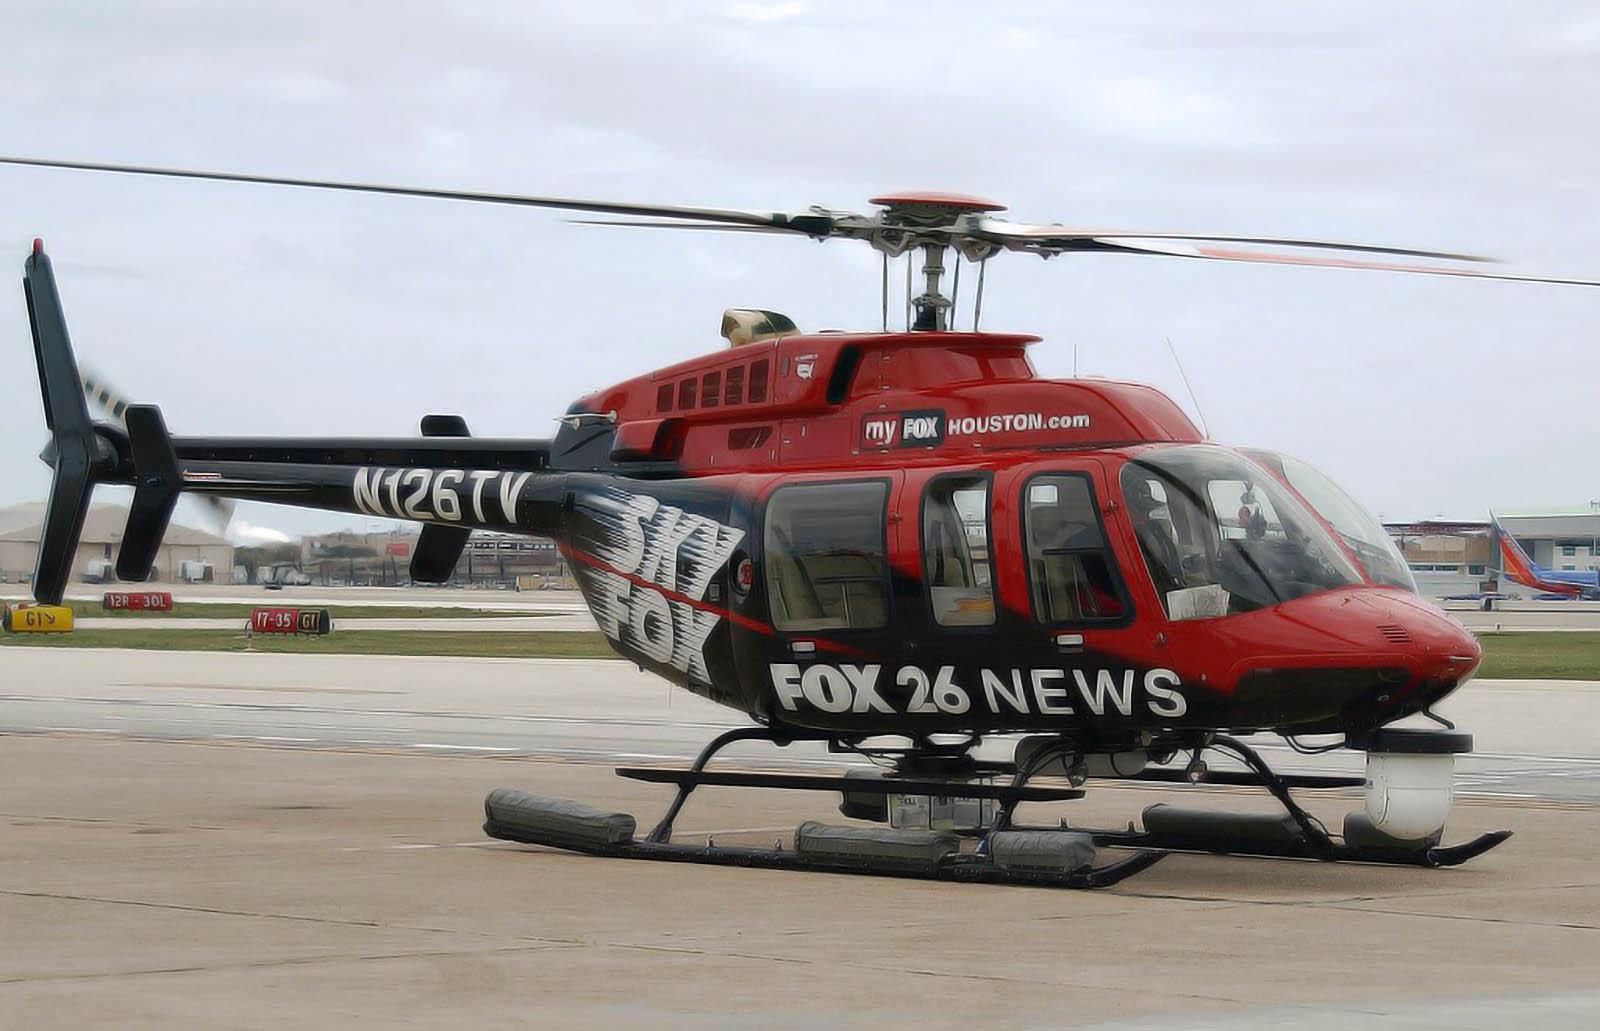 Sky Fox Fox 26 News